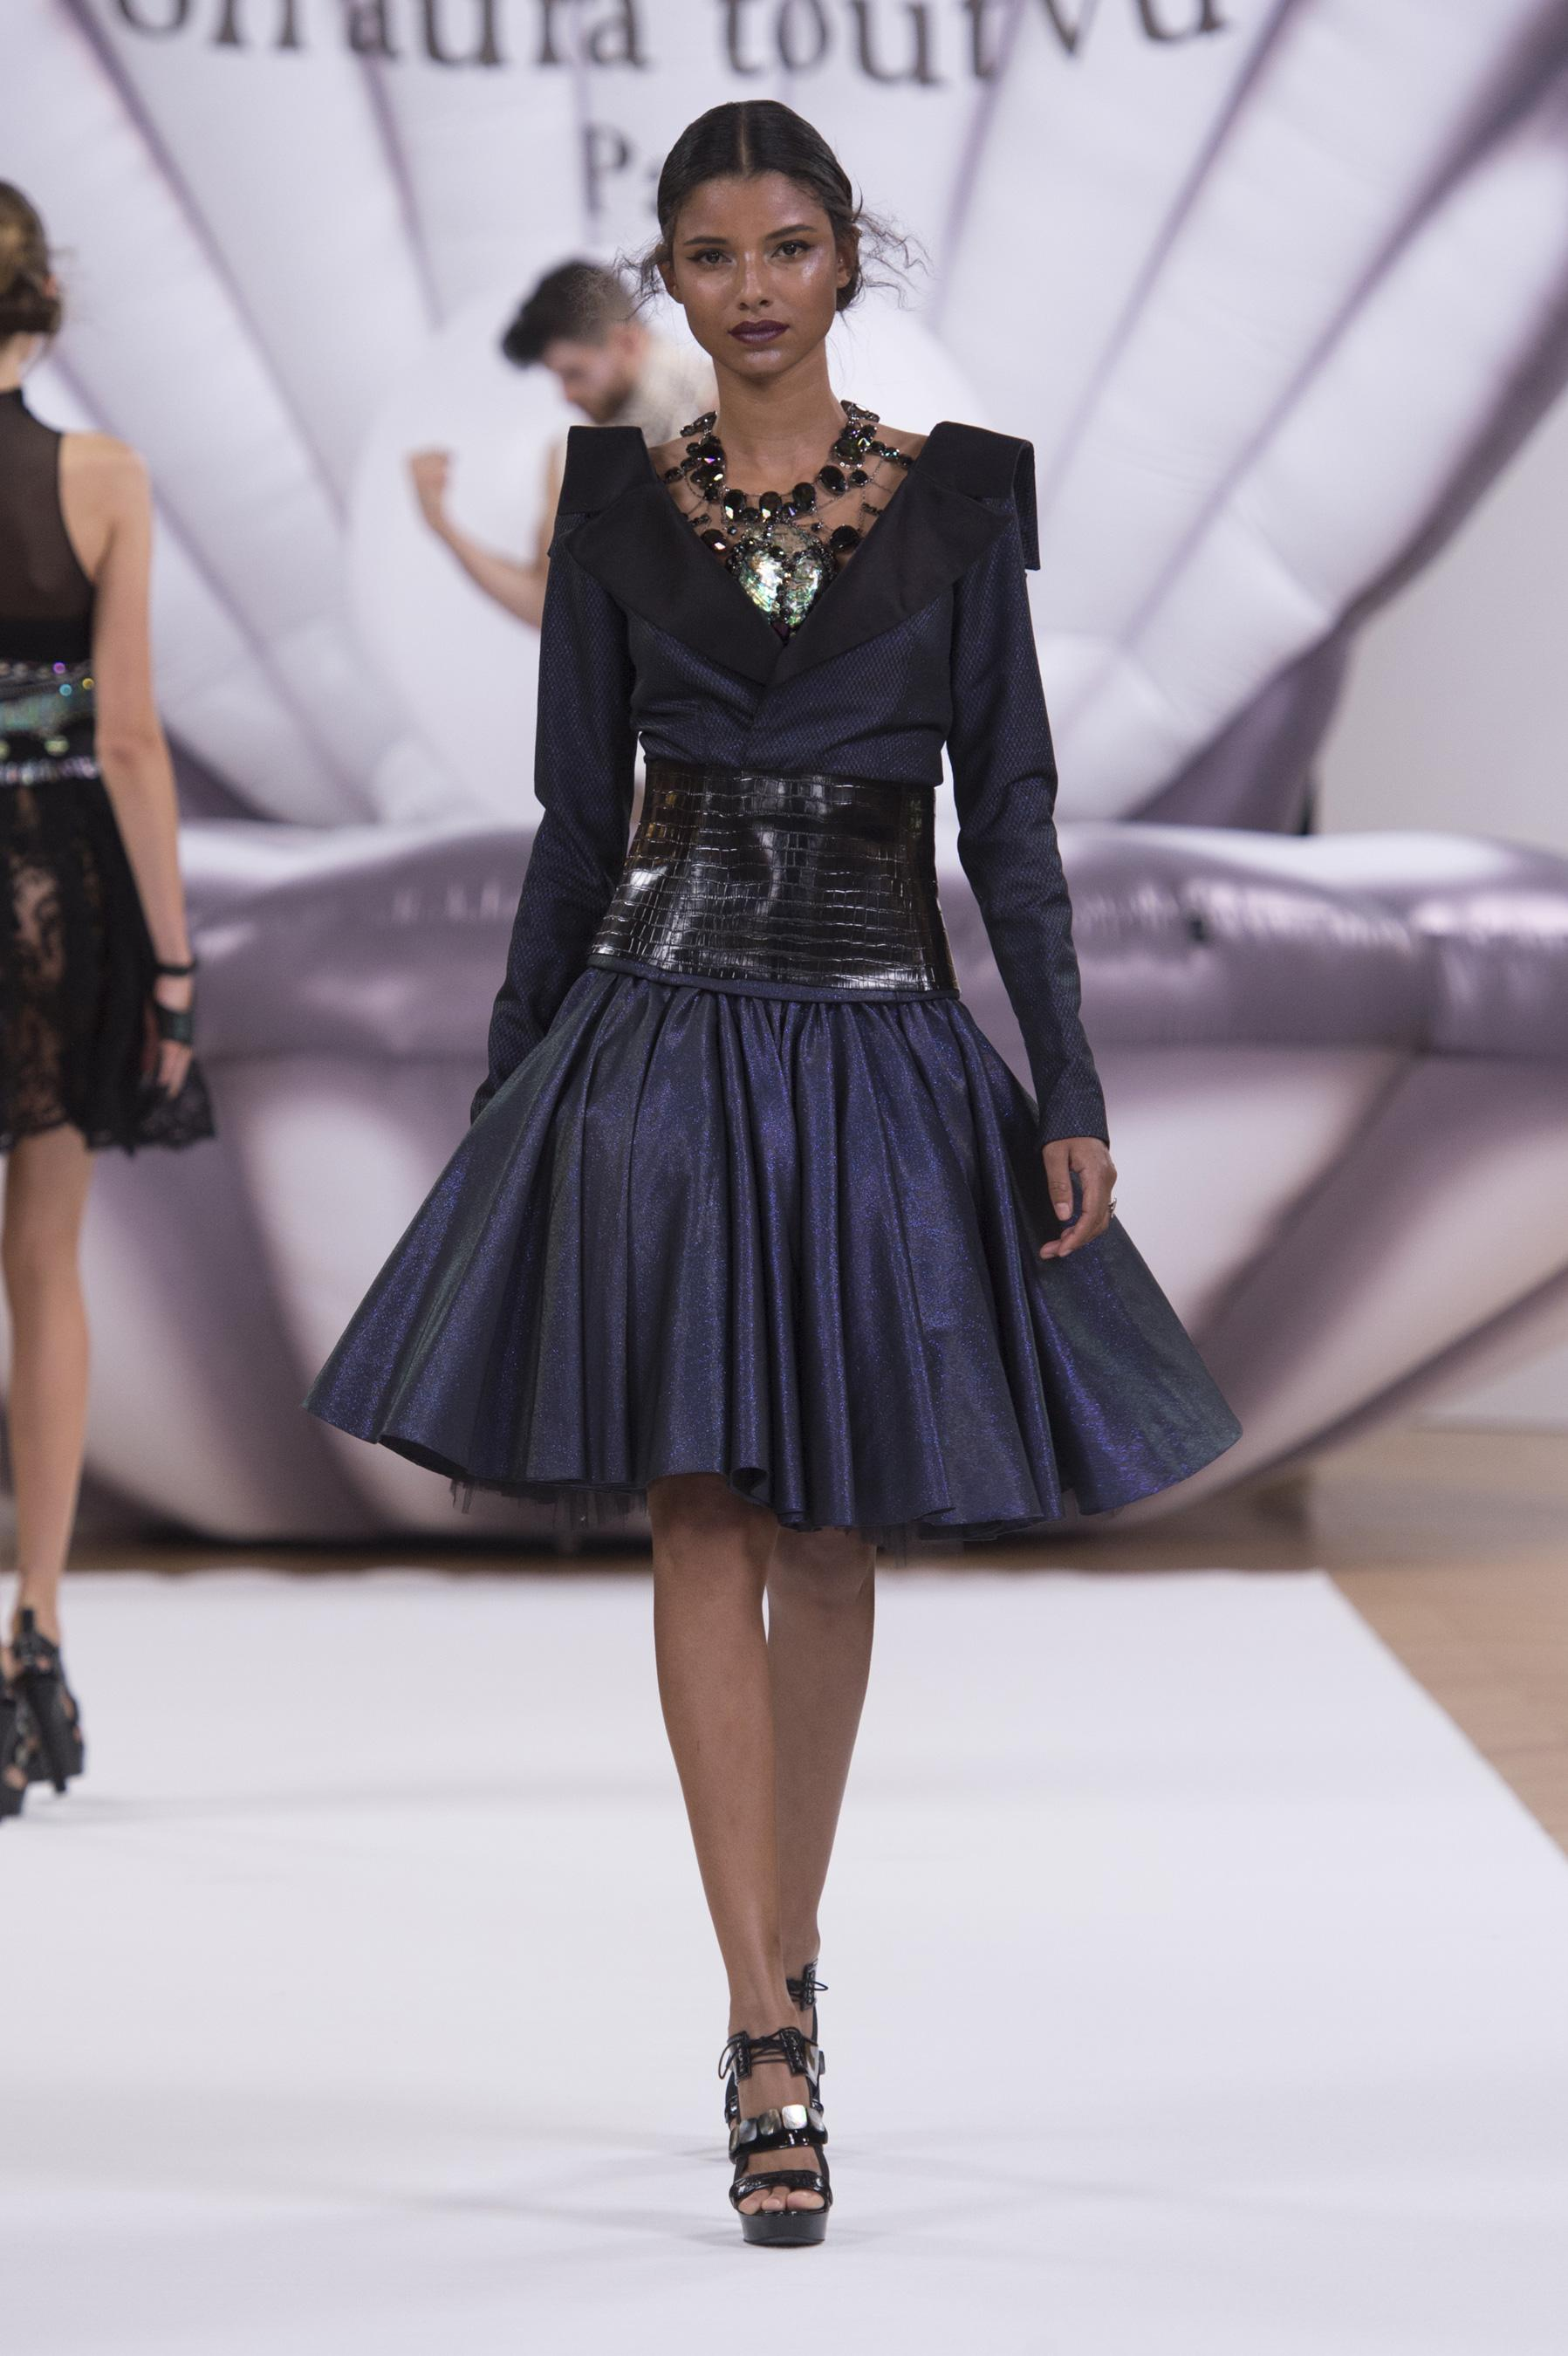 D fil on aura tout vu printemps t 2017 couture madame figaro - Idee look printemps 2017 ...